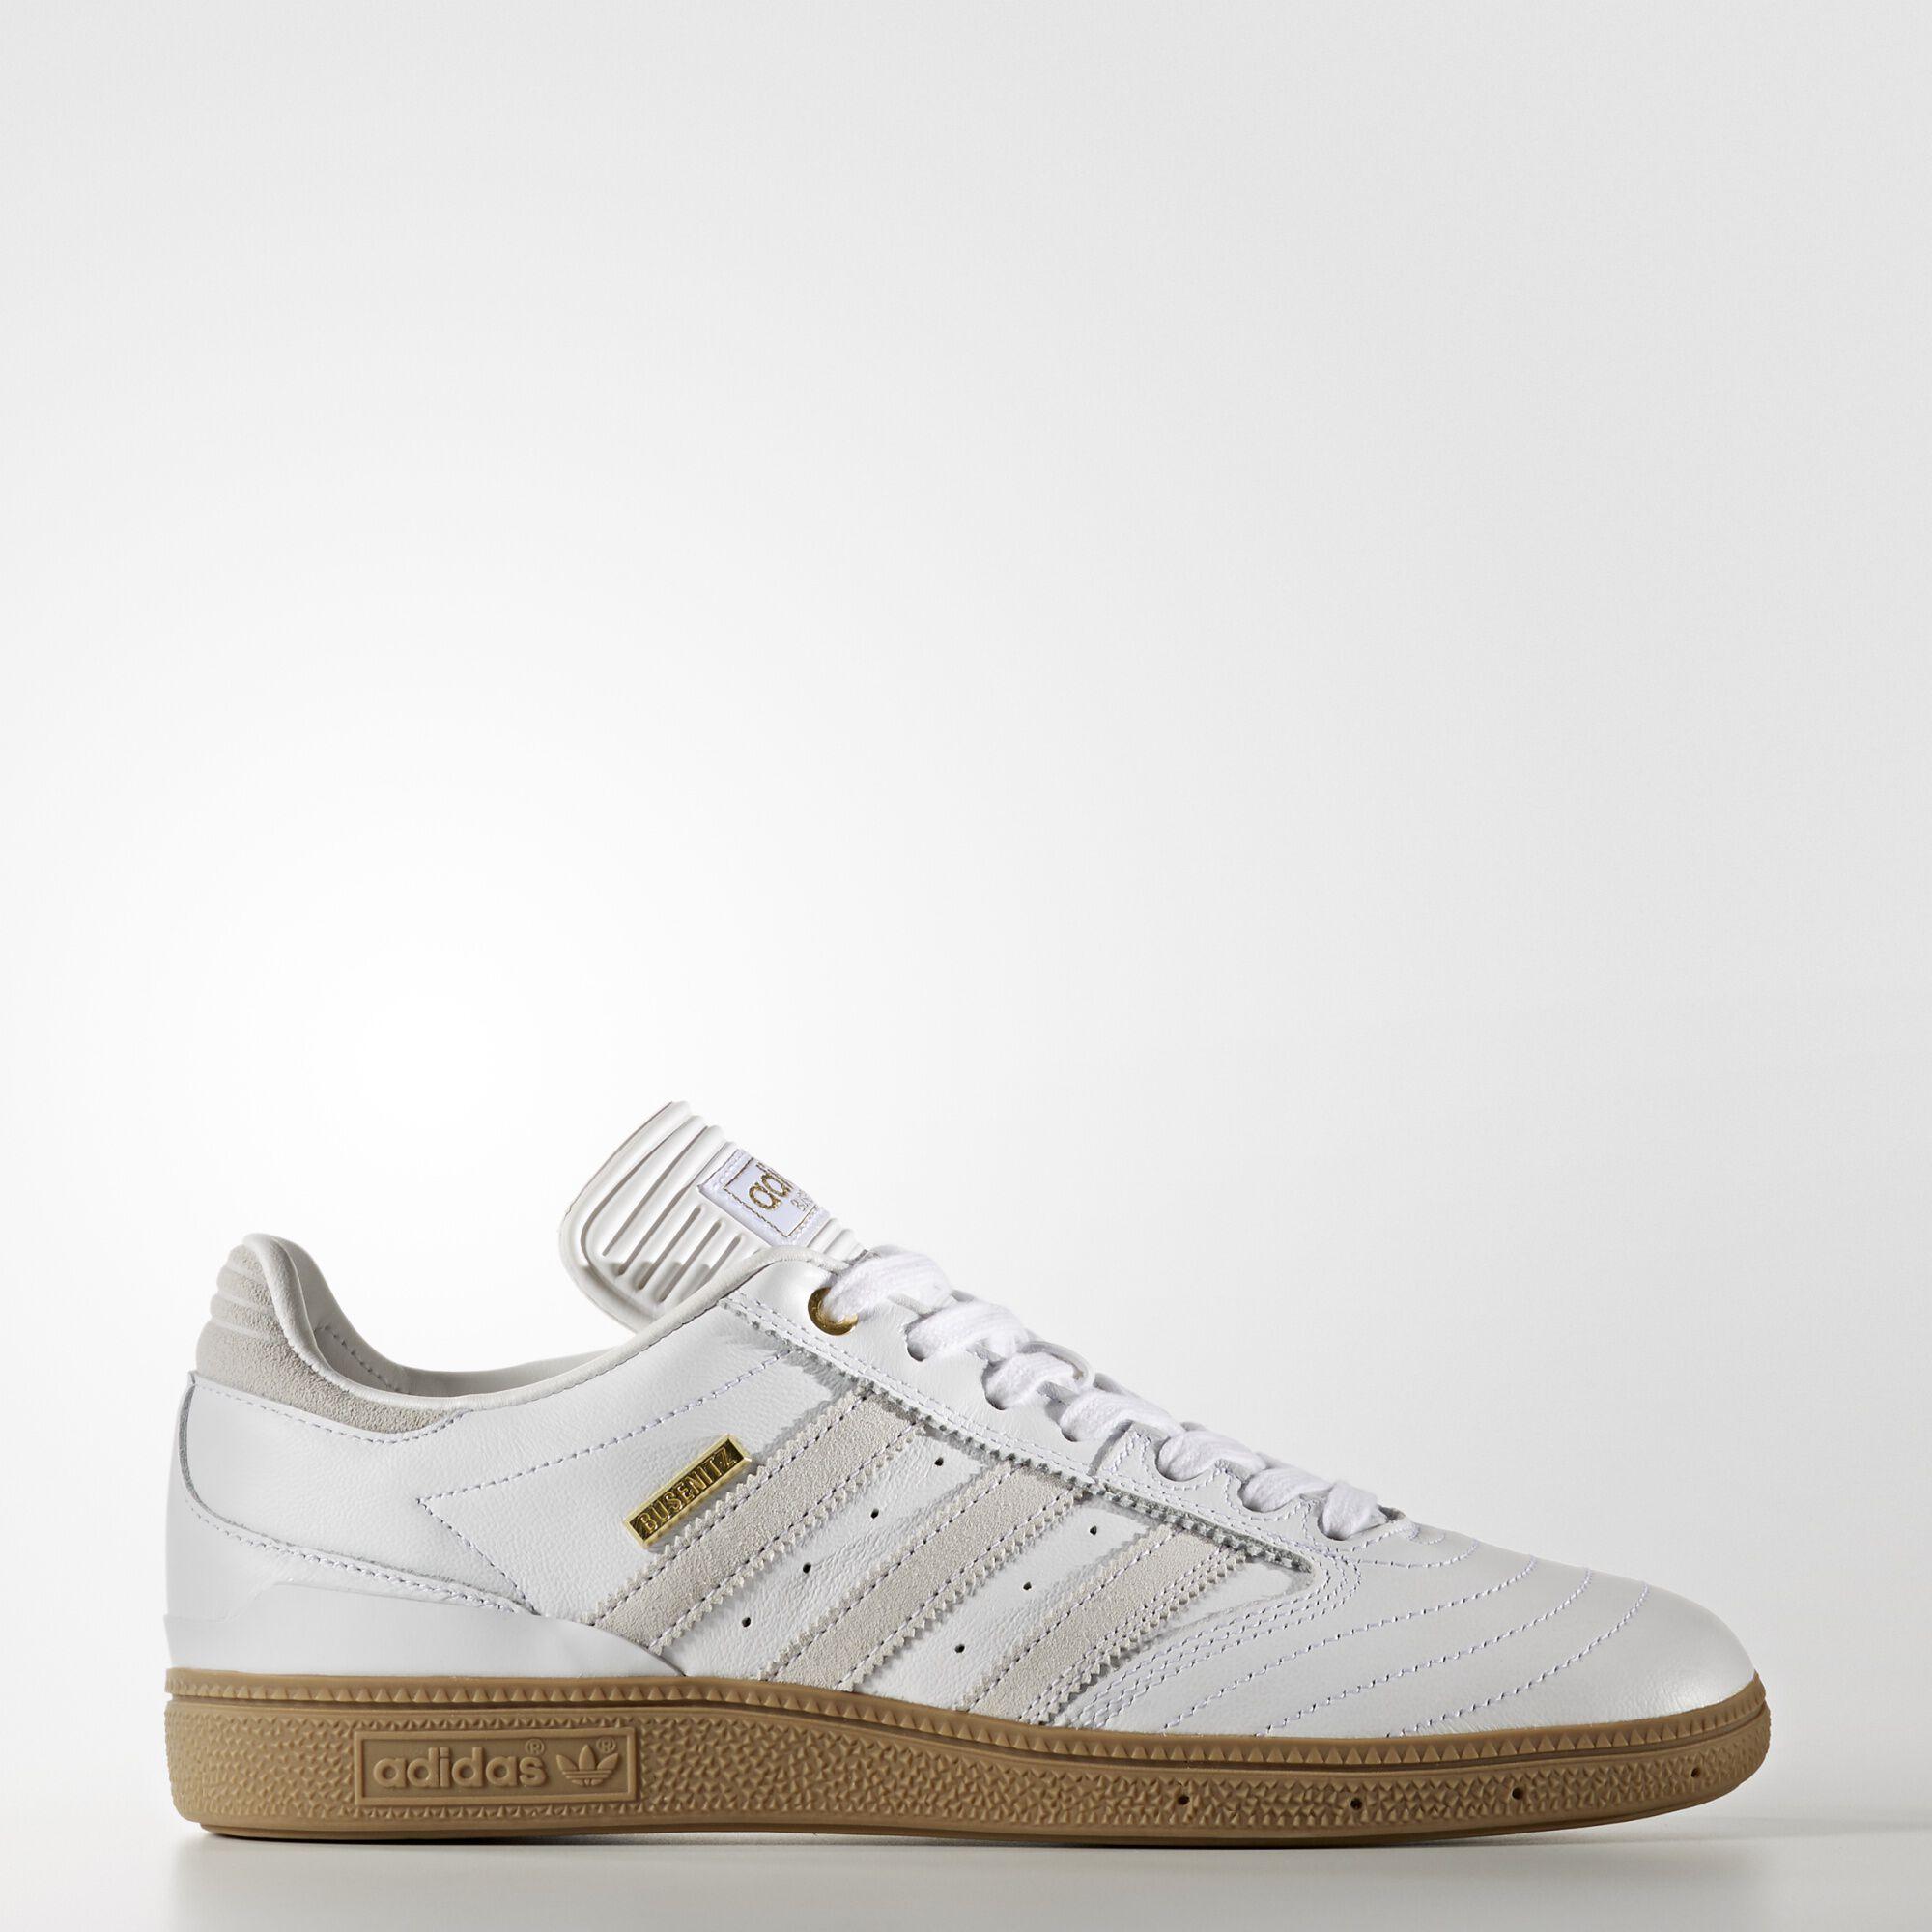 ... adidas - Busenitz Pro Shoes Running White   Running White   Gold  Metallic F37872 Women s ... 8fde647cb